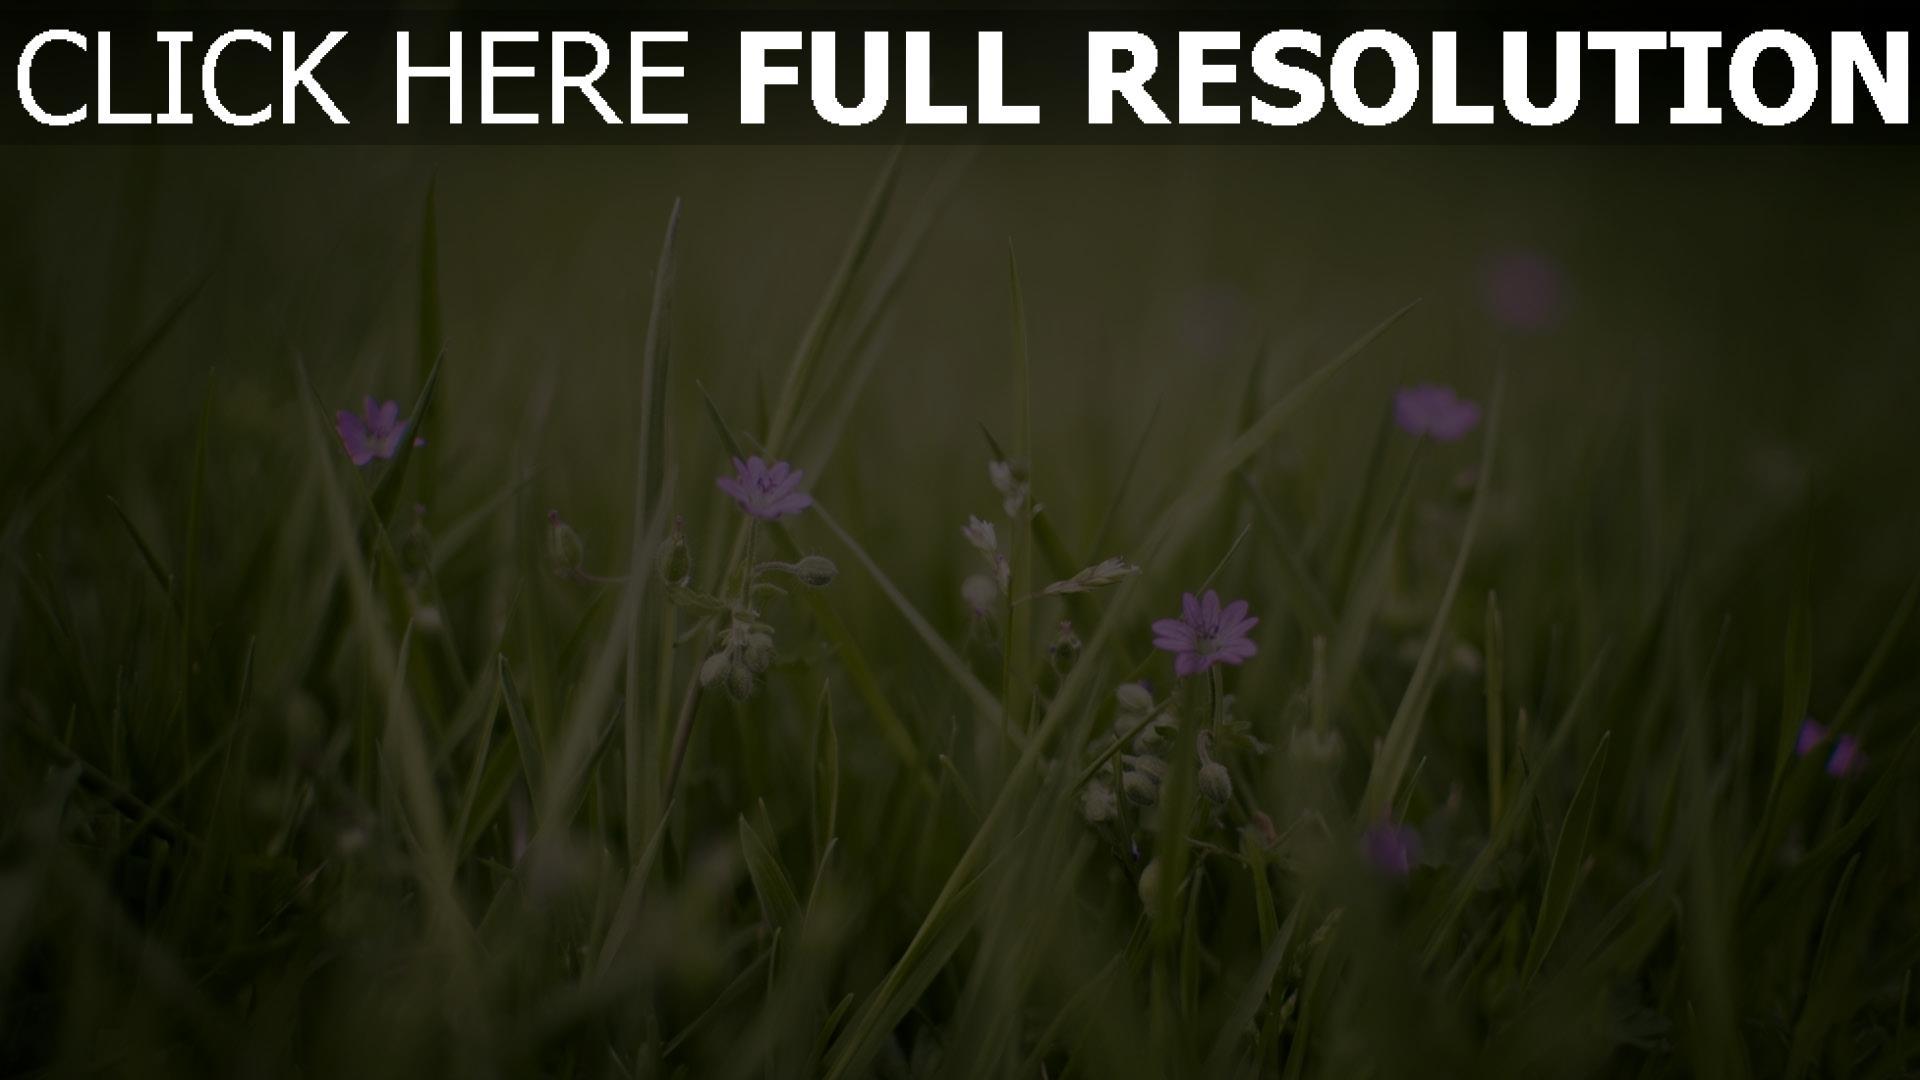 herunterladen 1920x1080 full hd hintergrundbilder blumen wildblumen lila gras fr hling 1080p. Black Bedroom Furniture Sets. Home Design Ideas